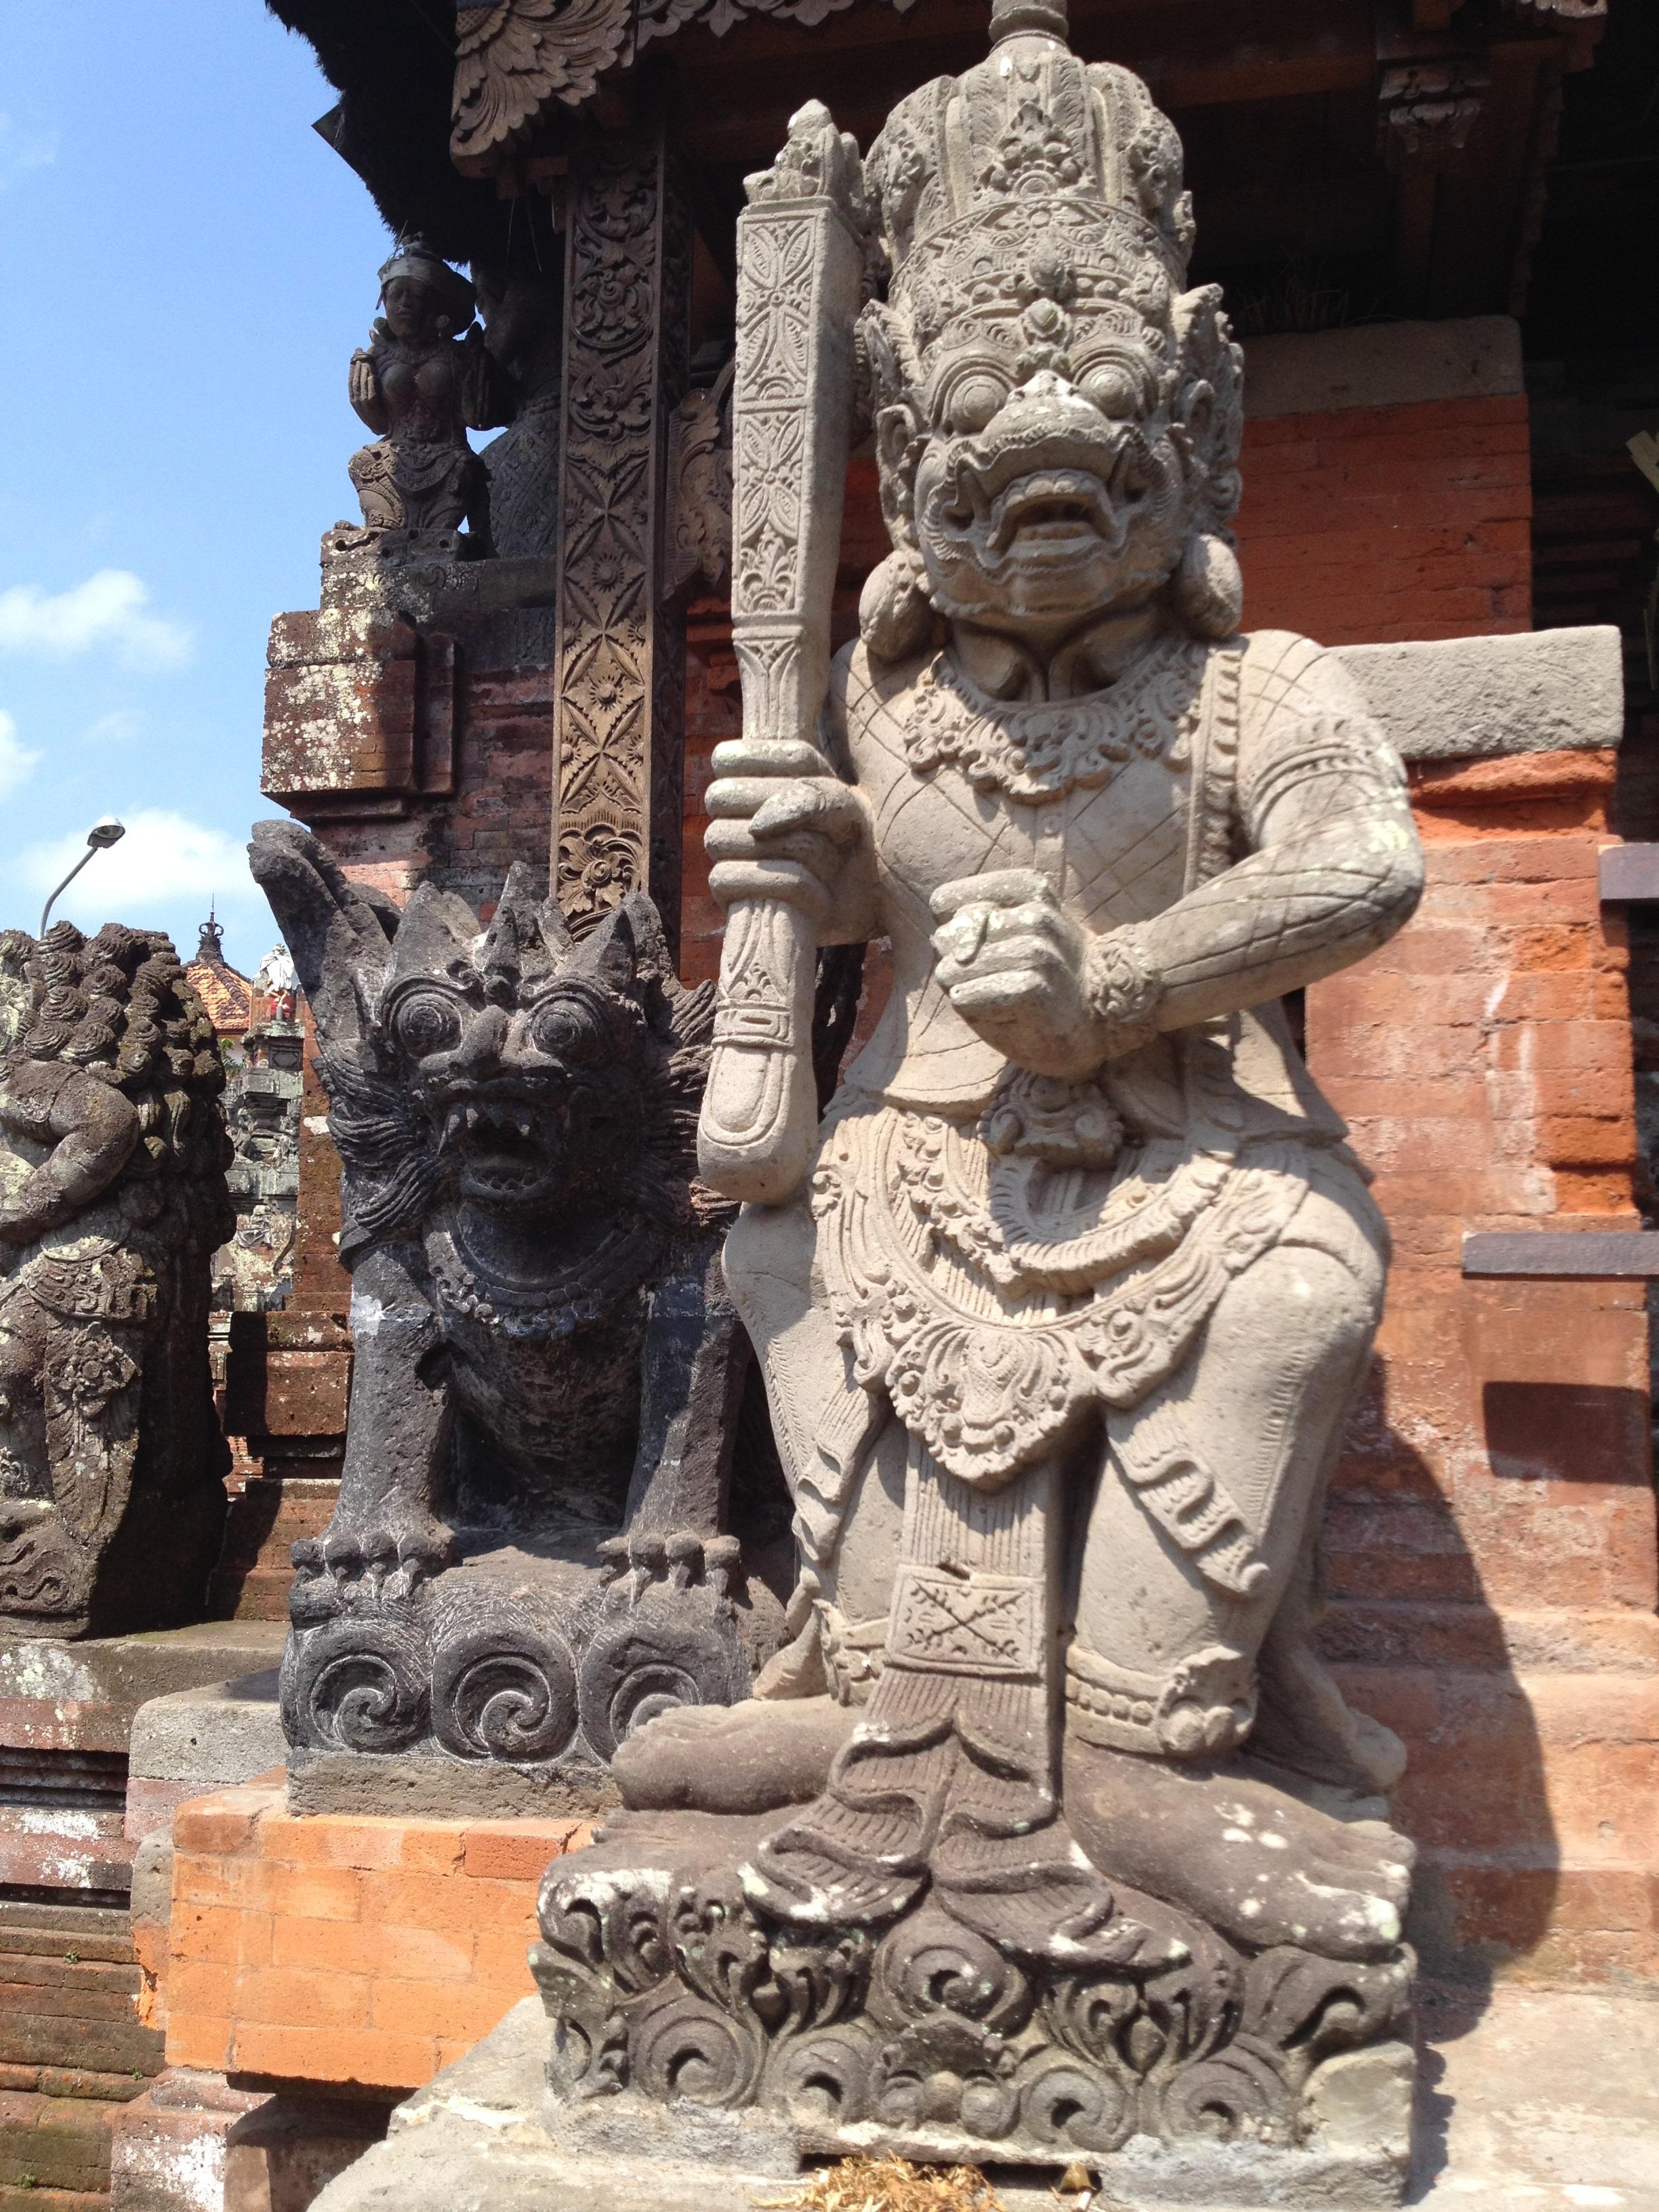 Gambar : Monumen, patung, seni, Candi, Indonesia, fitur